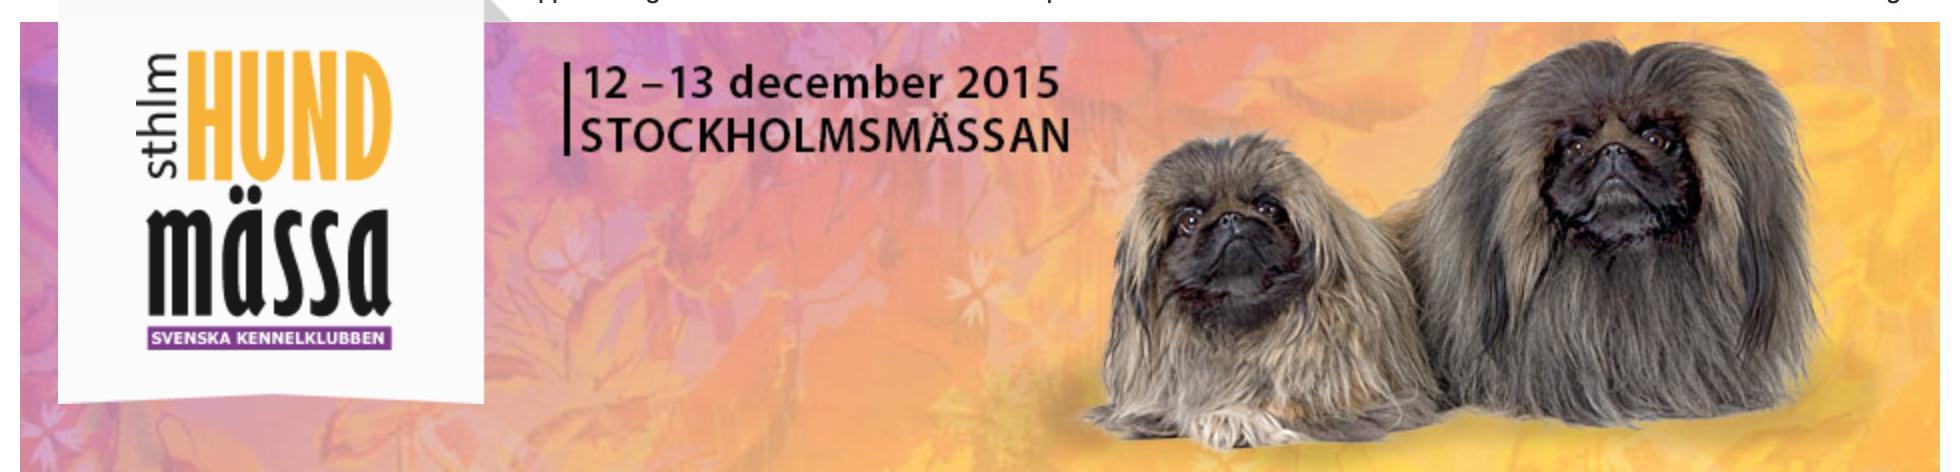 Skärmavbild 2015-12-11 kl. 17.35.26